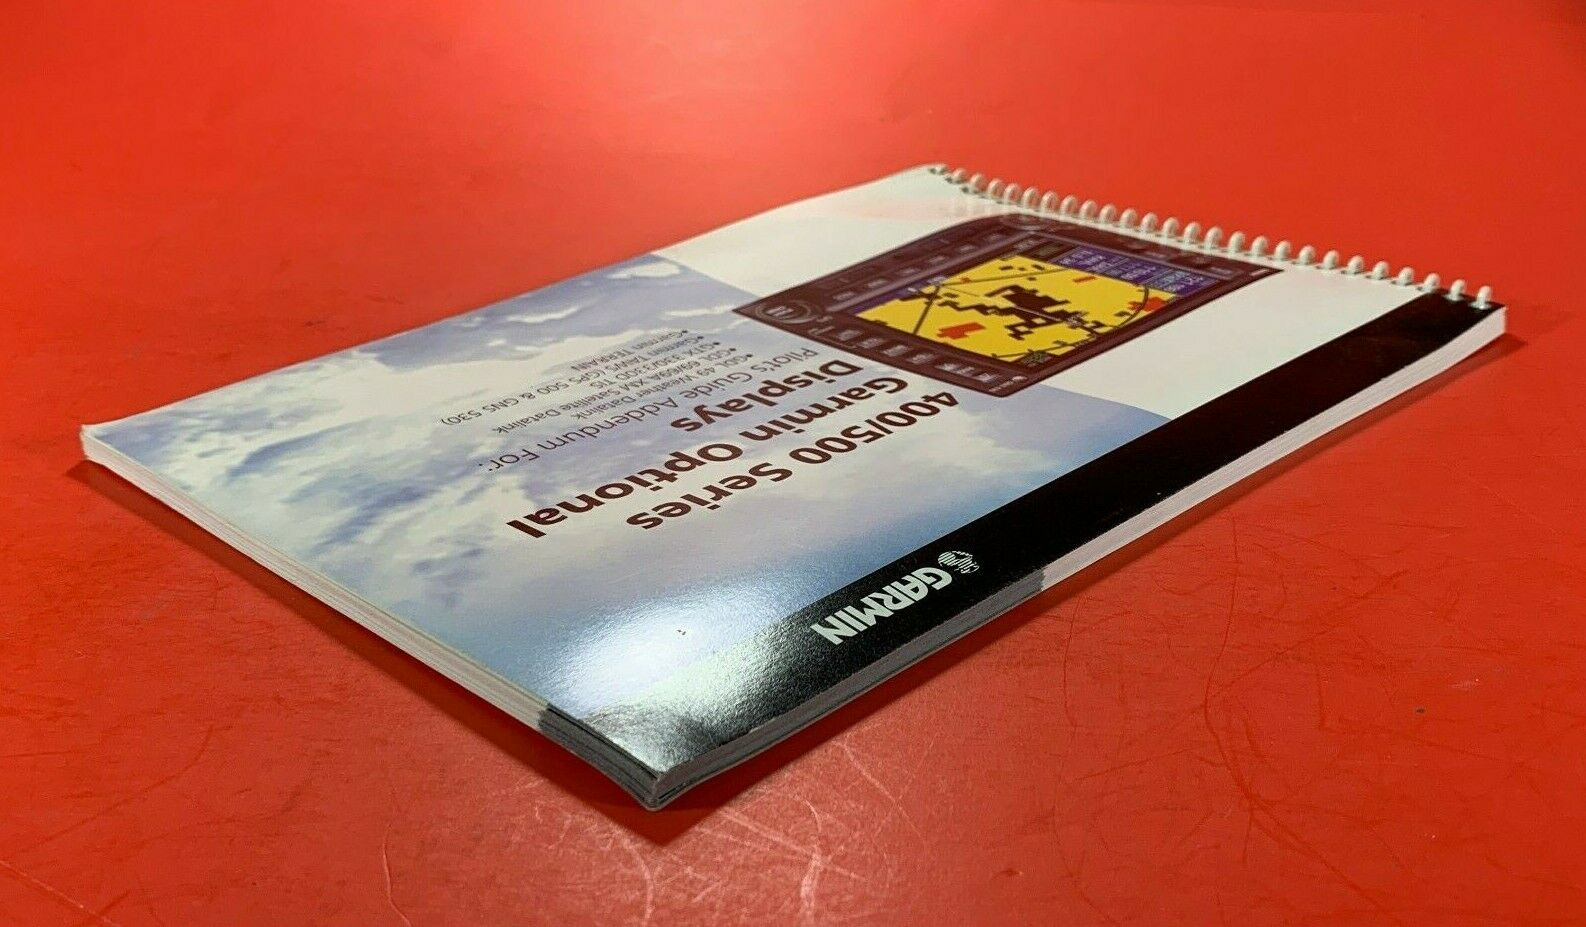 2005 Garmin 400 500 Series Optional Displays Pilot's Guide Addendum 190-00140-13